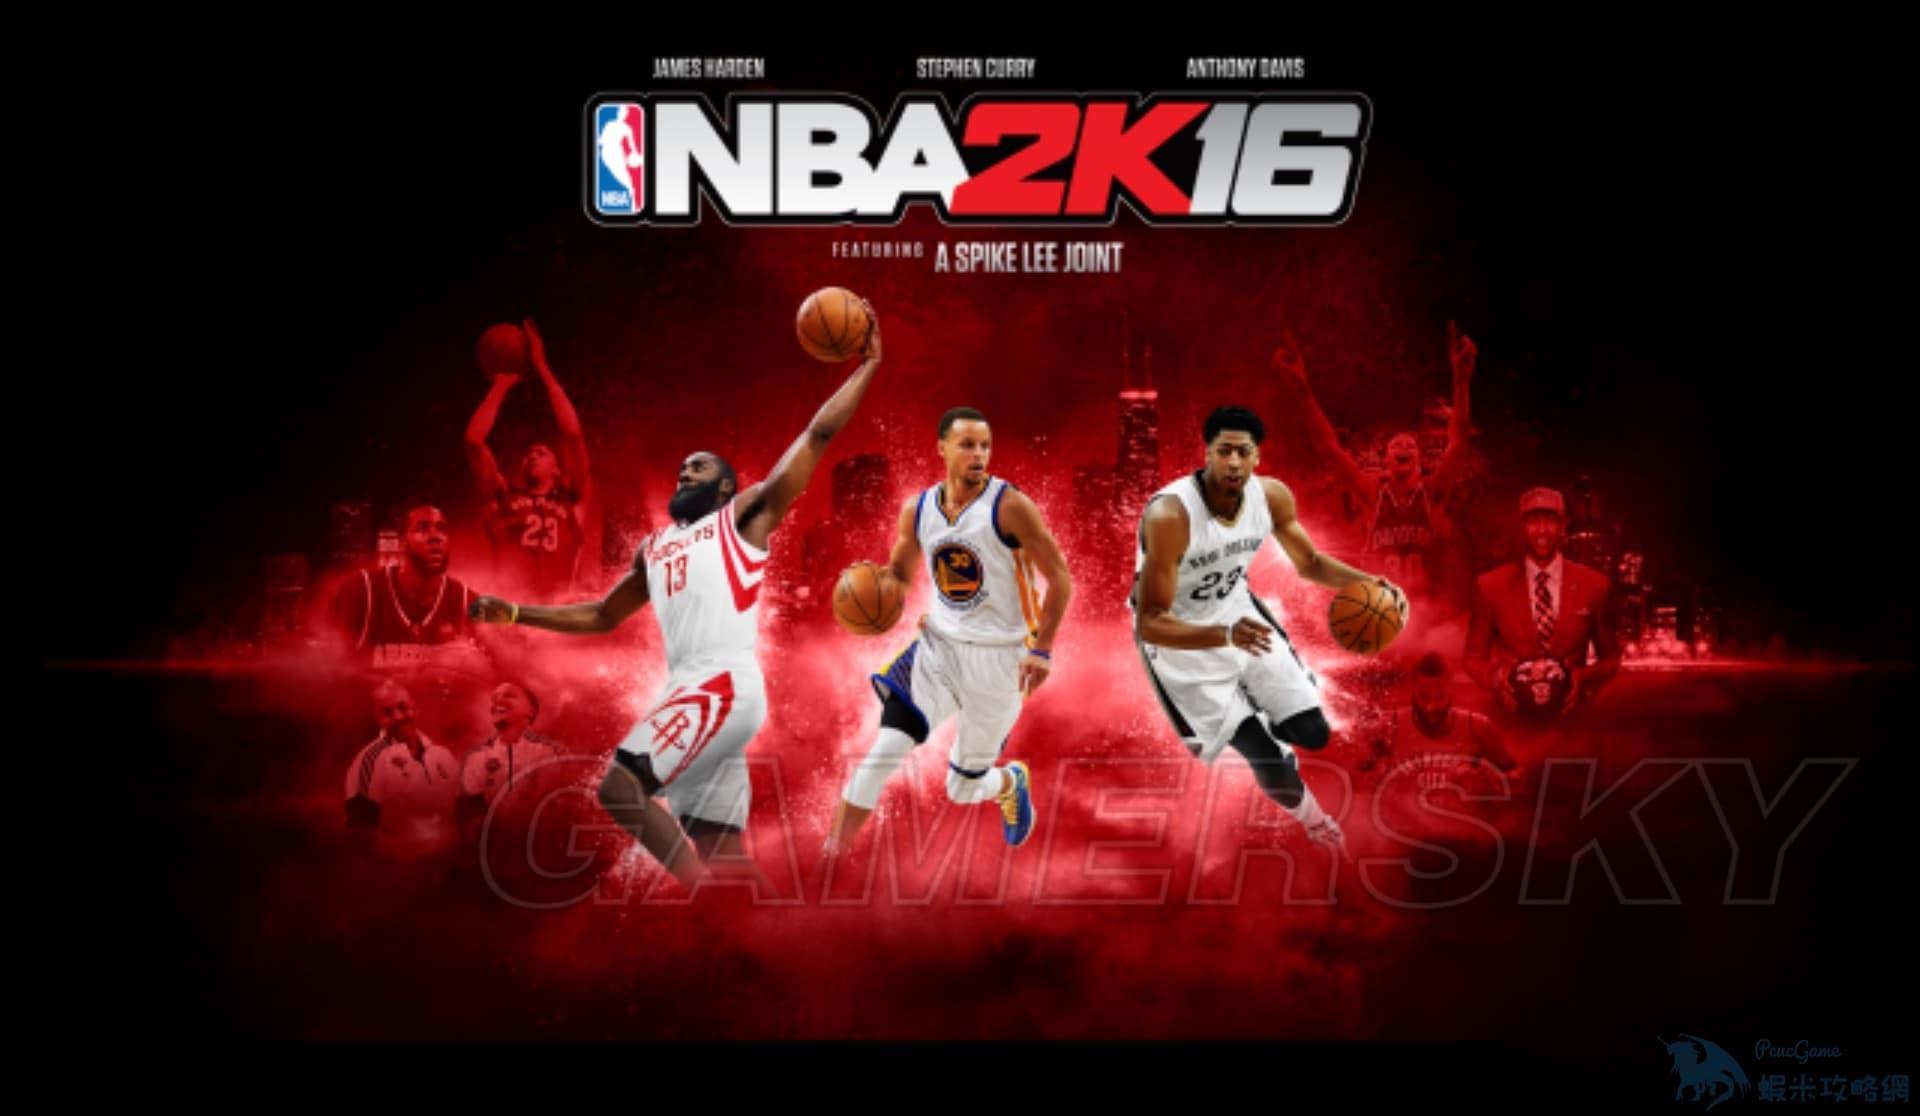 NBA2K16 mt模式進攻與陣容技巧分析 mt模式怎麼玩